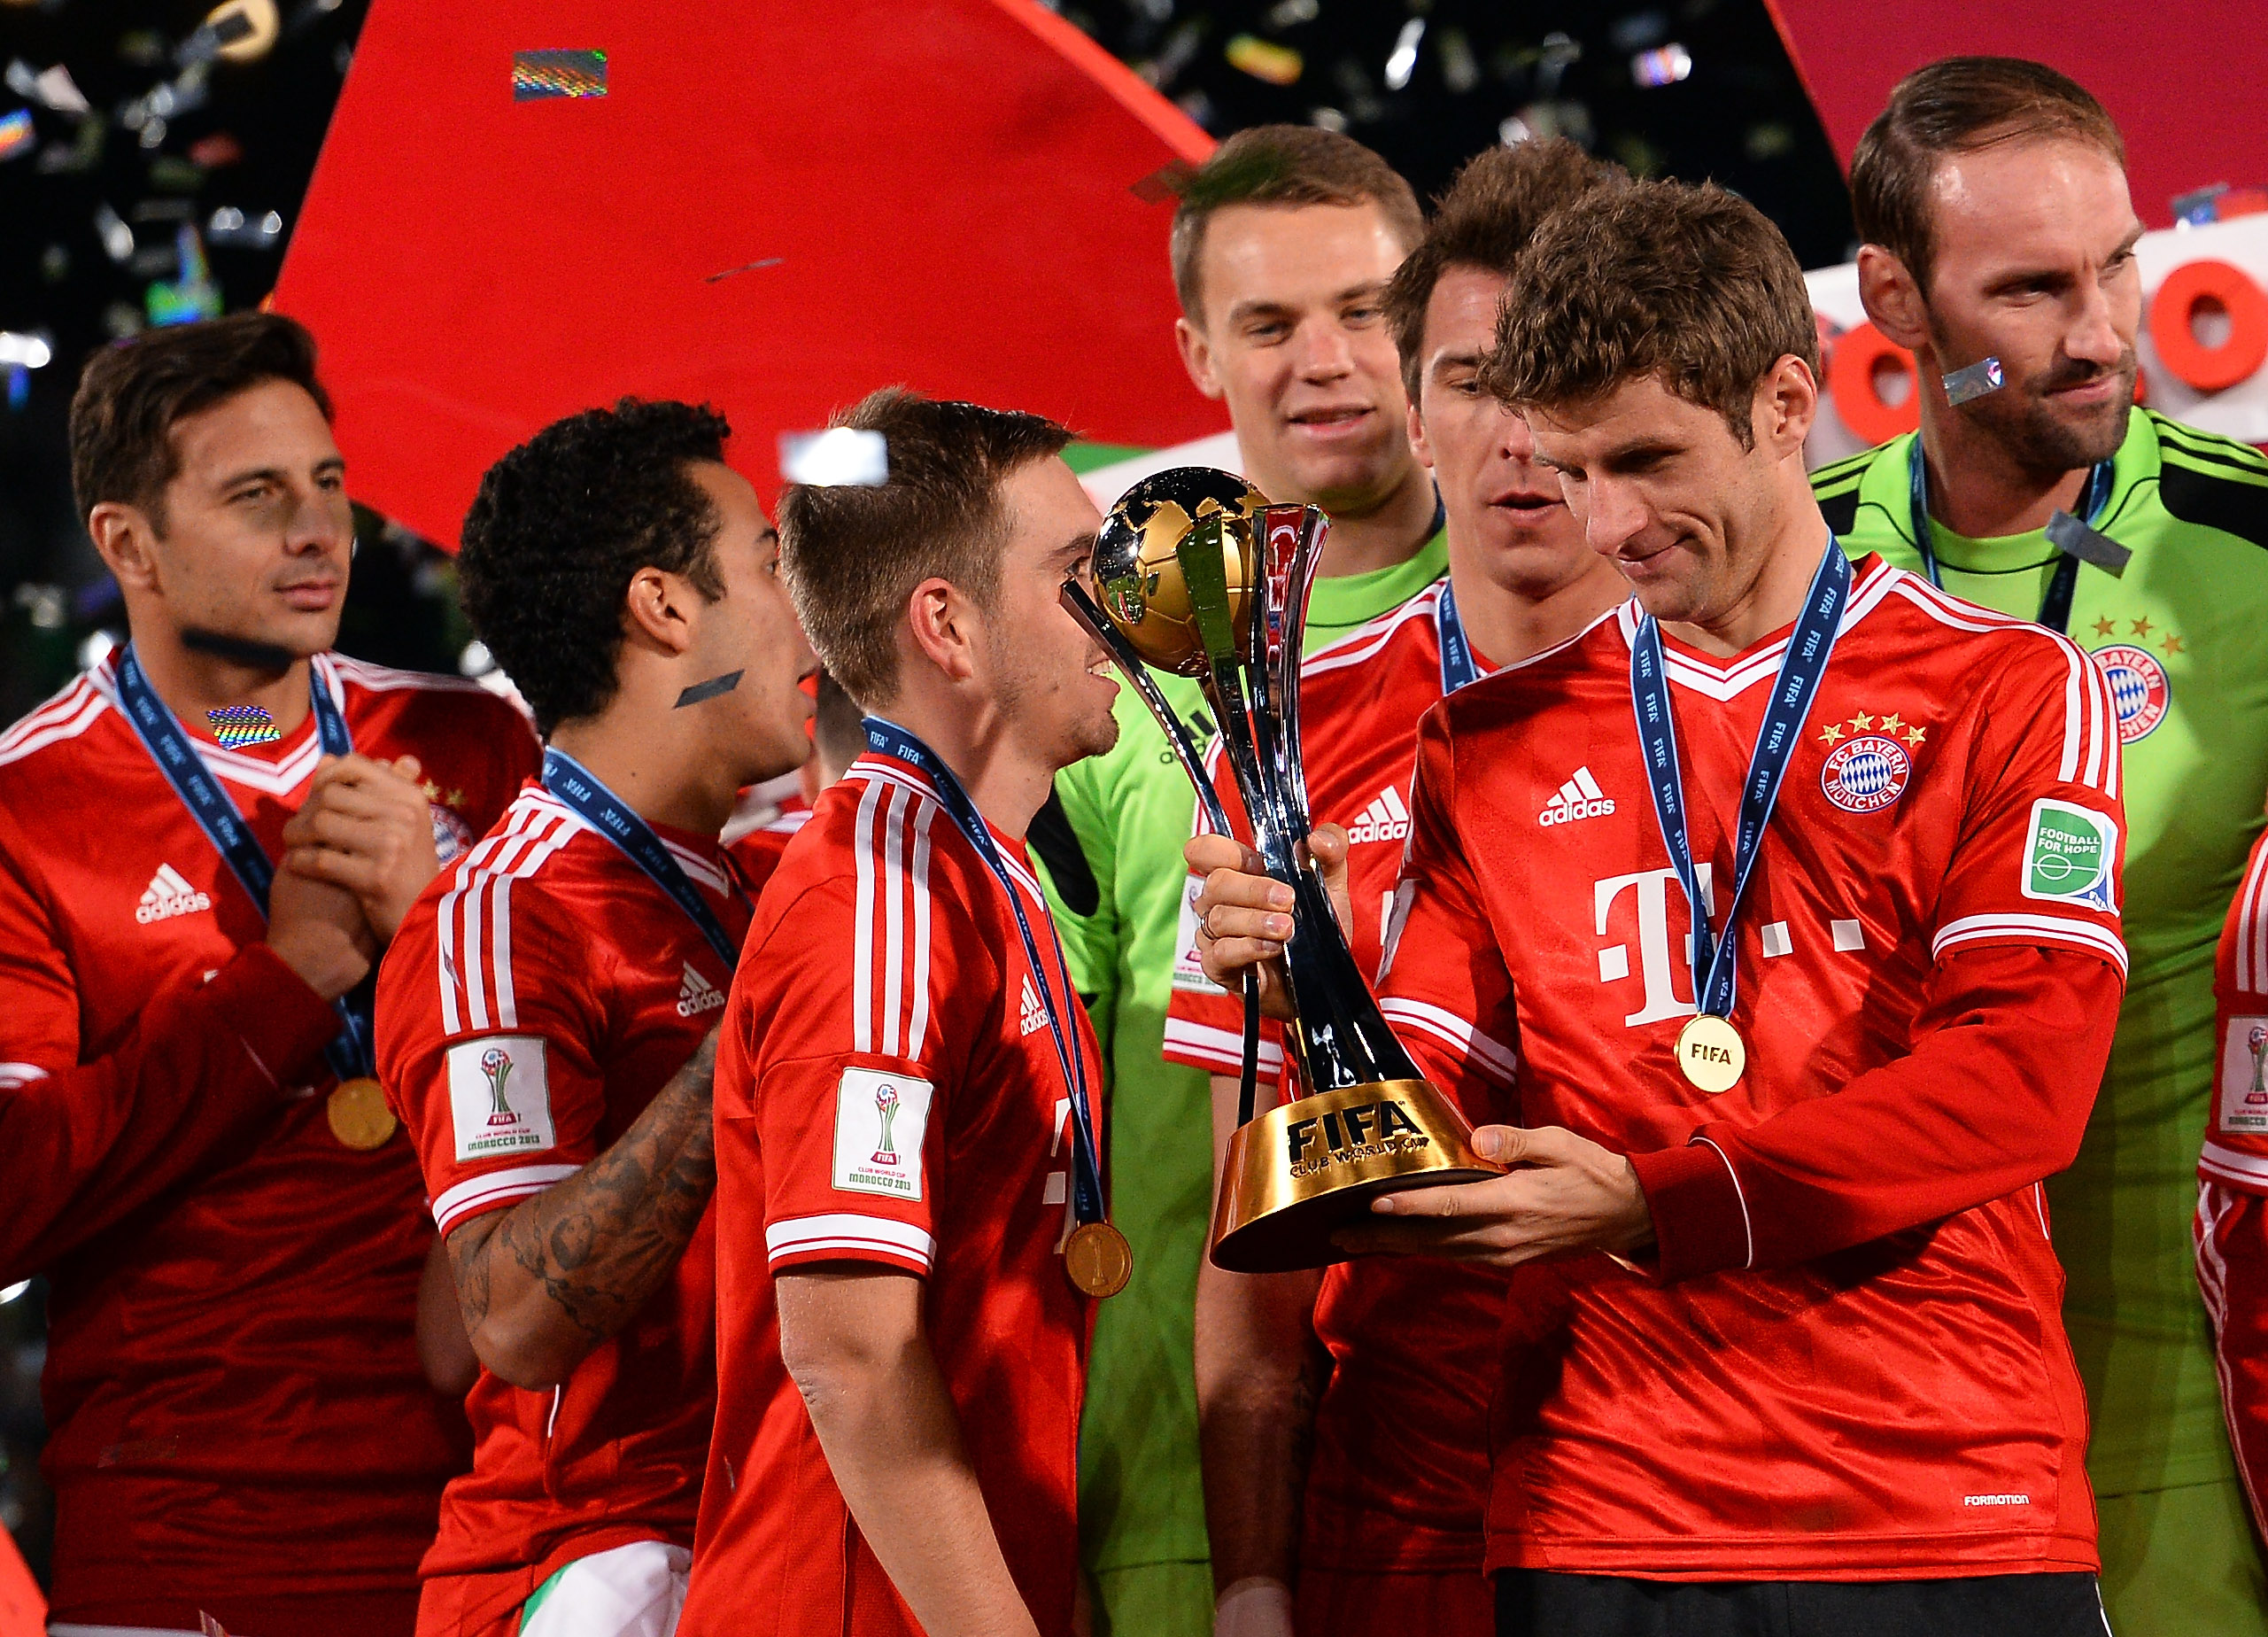 FC Bayern Munchen v Raja Casablanca - FIFA Club World Cup Final